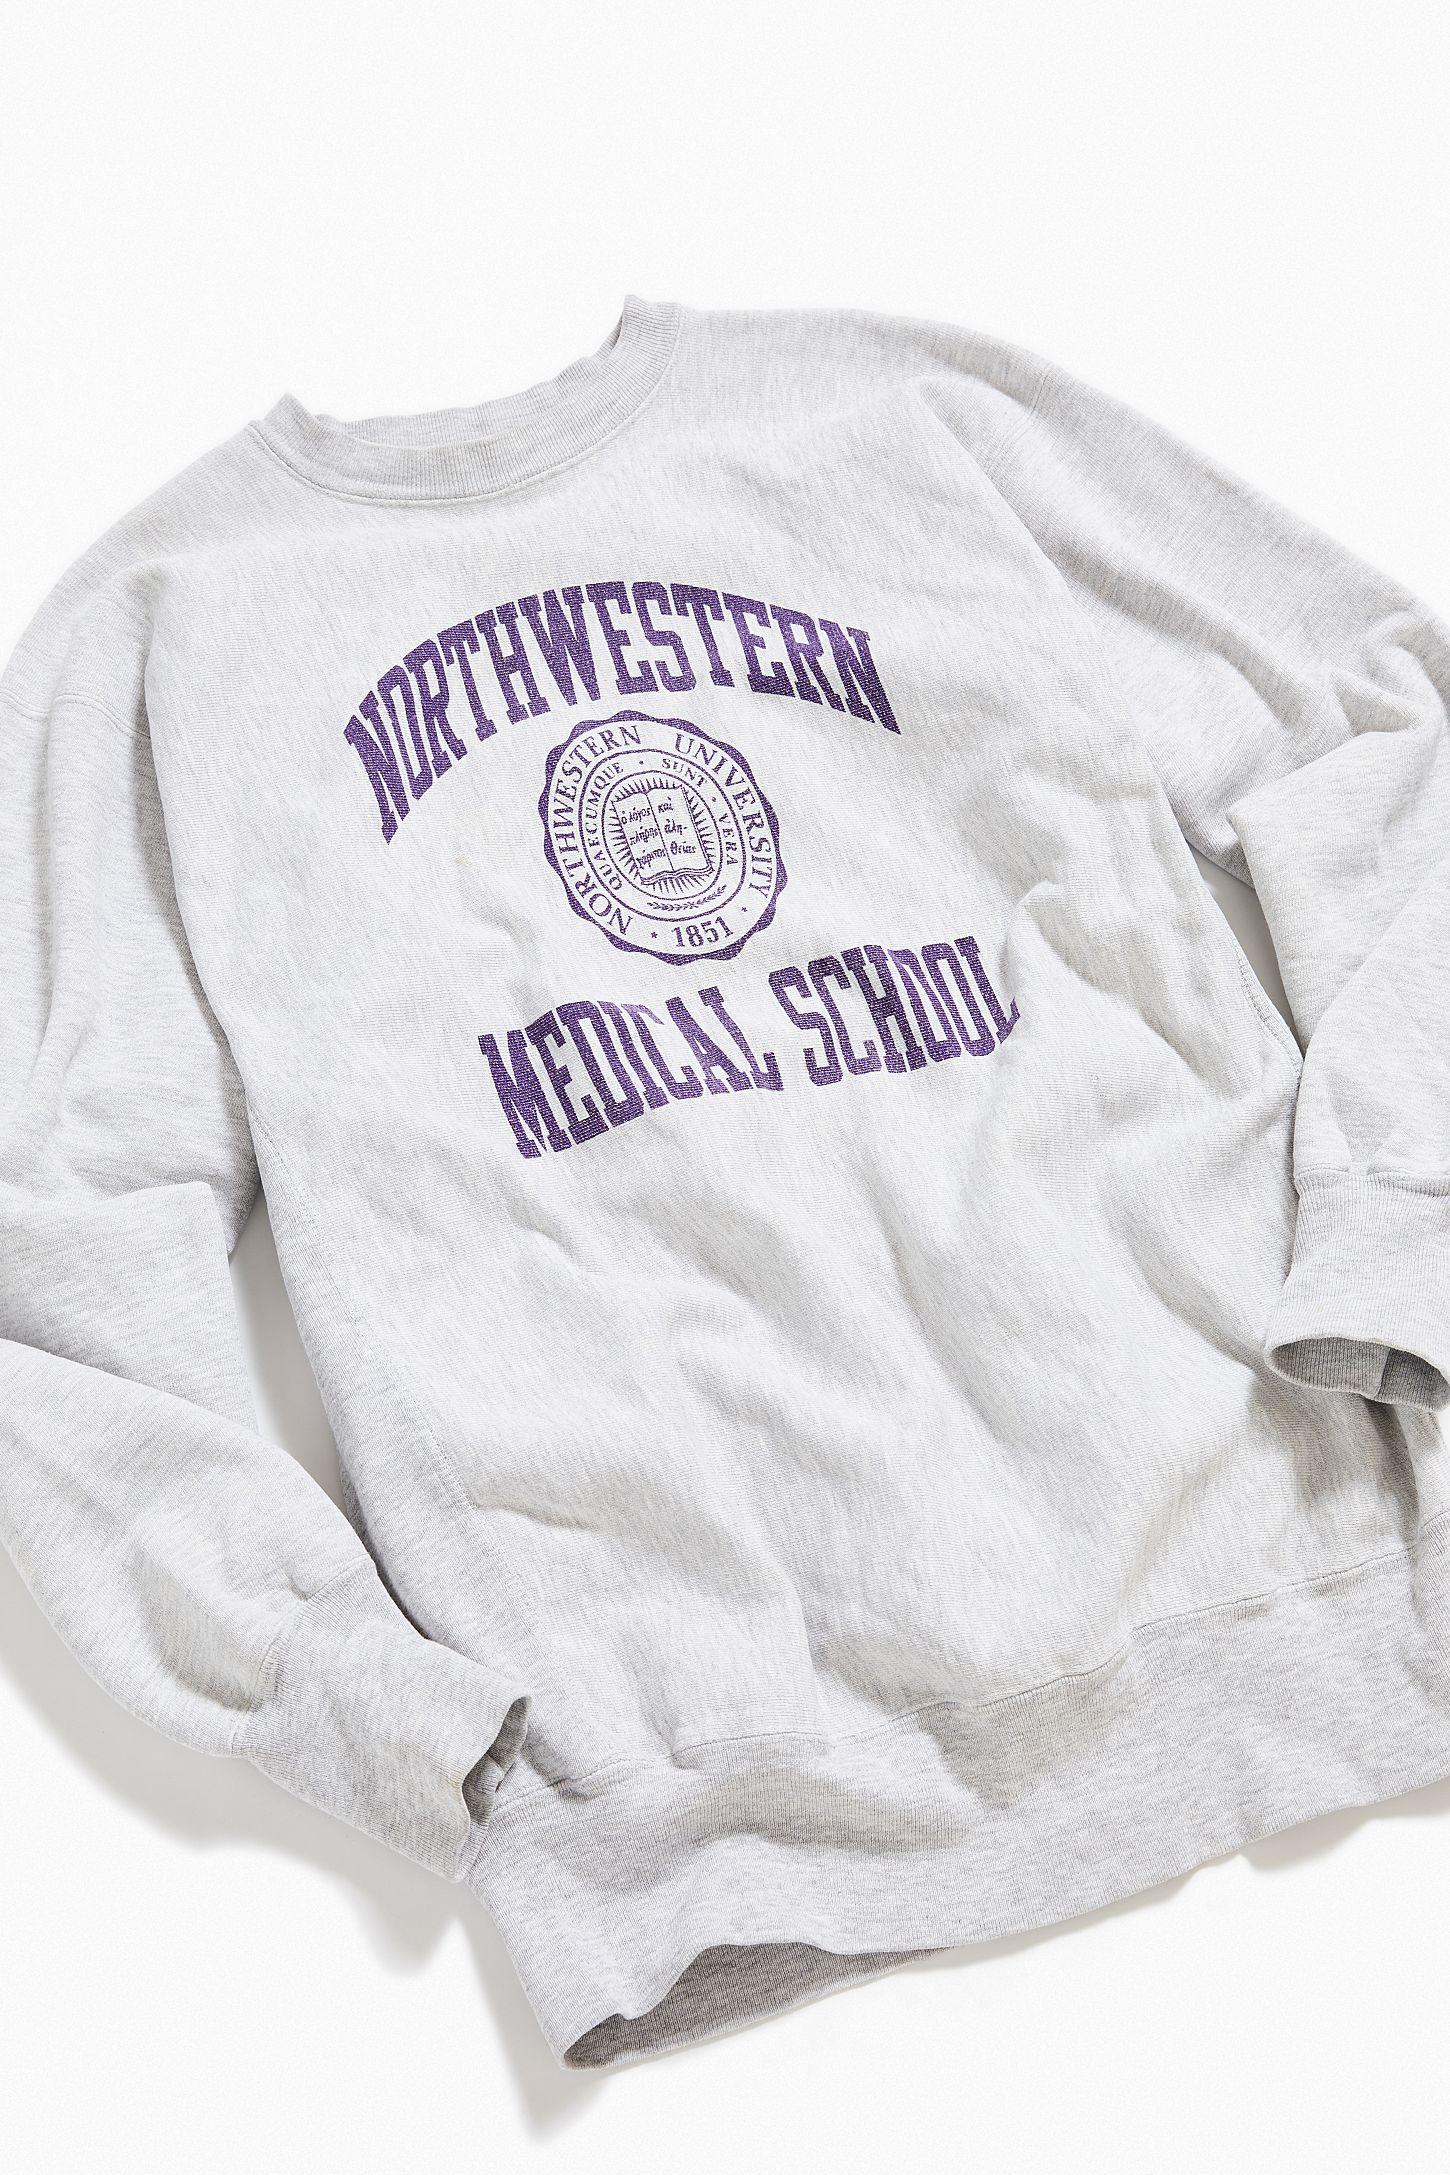 Vintage Northwestern Medical School Crew-Neck Sweatshirt